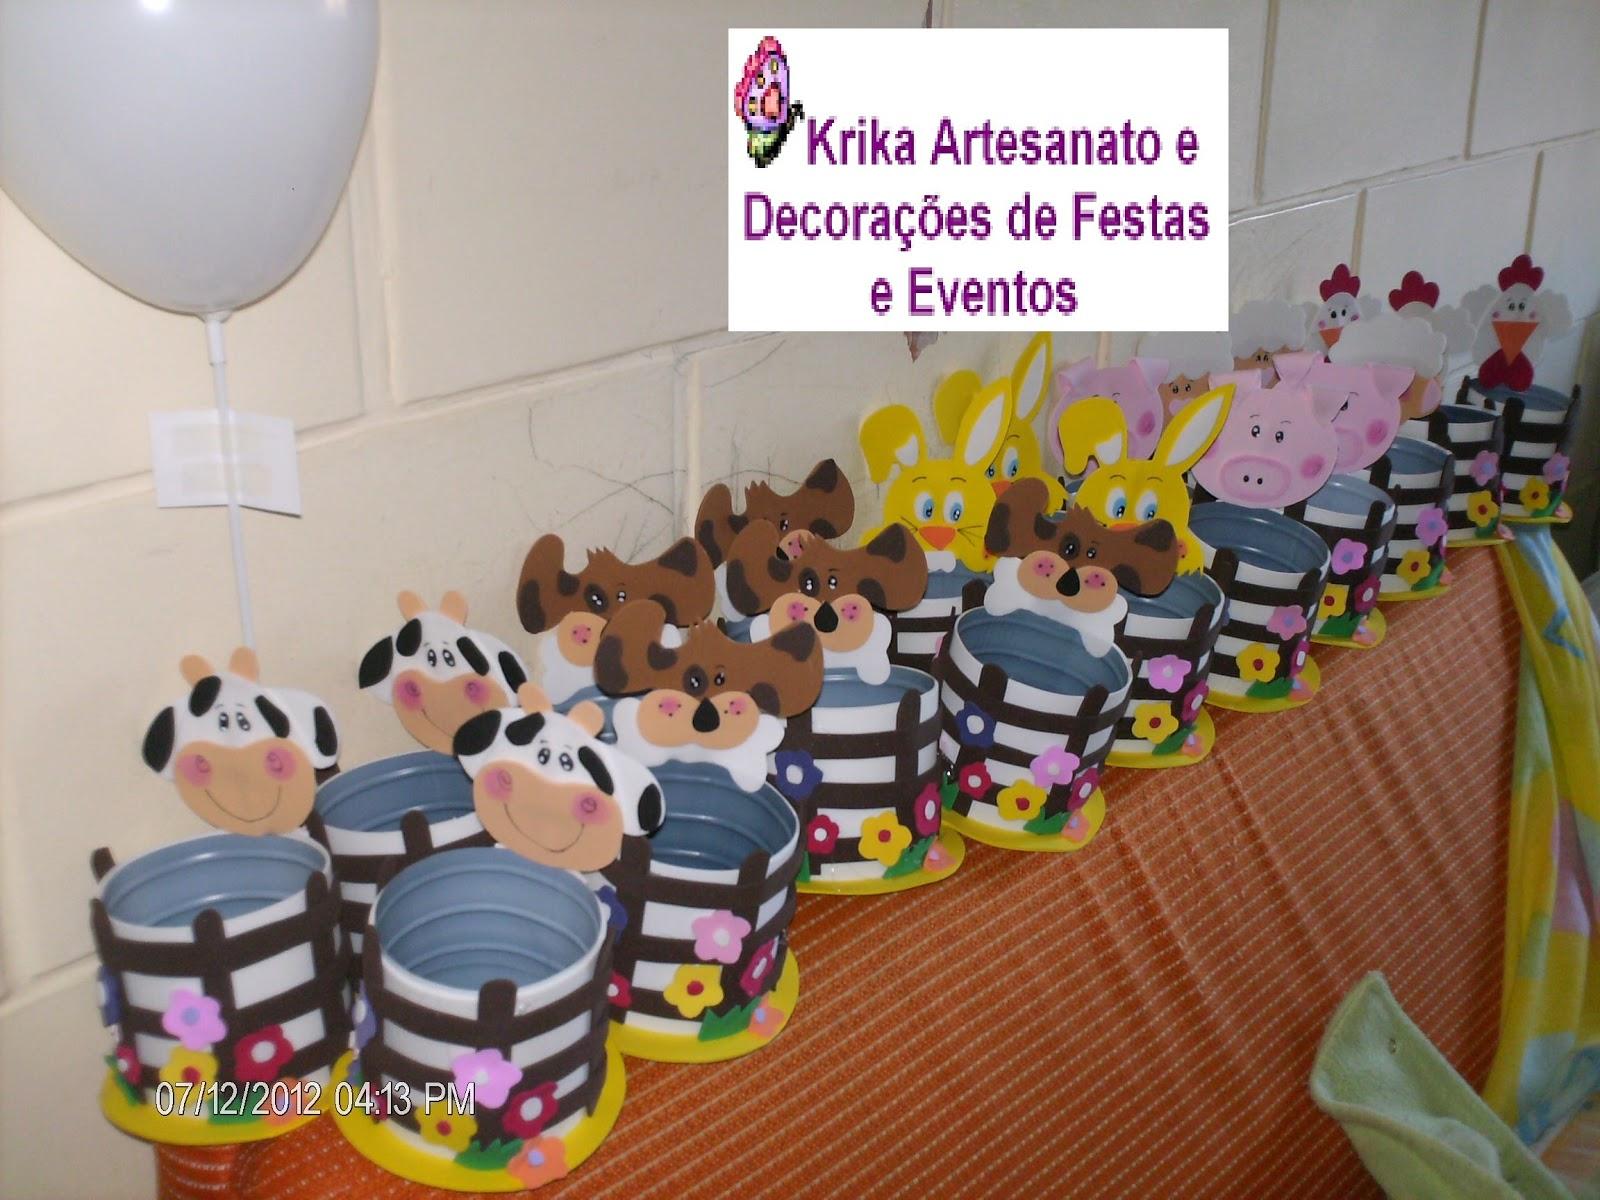 Decoracion de mesas mesa comunion de flores lmm board - Decoracion para comunion ...